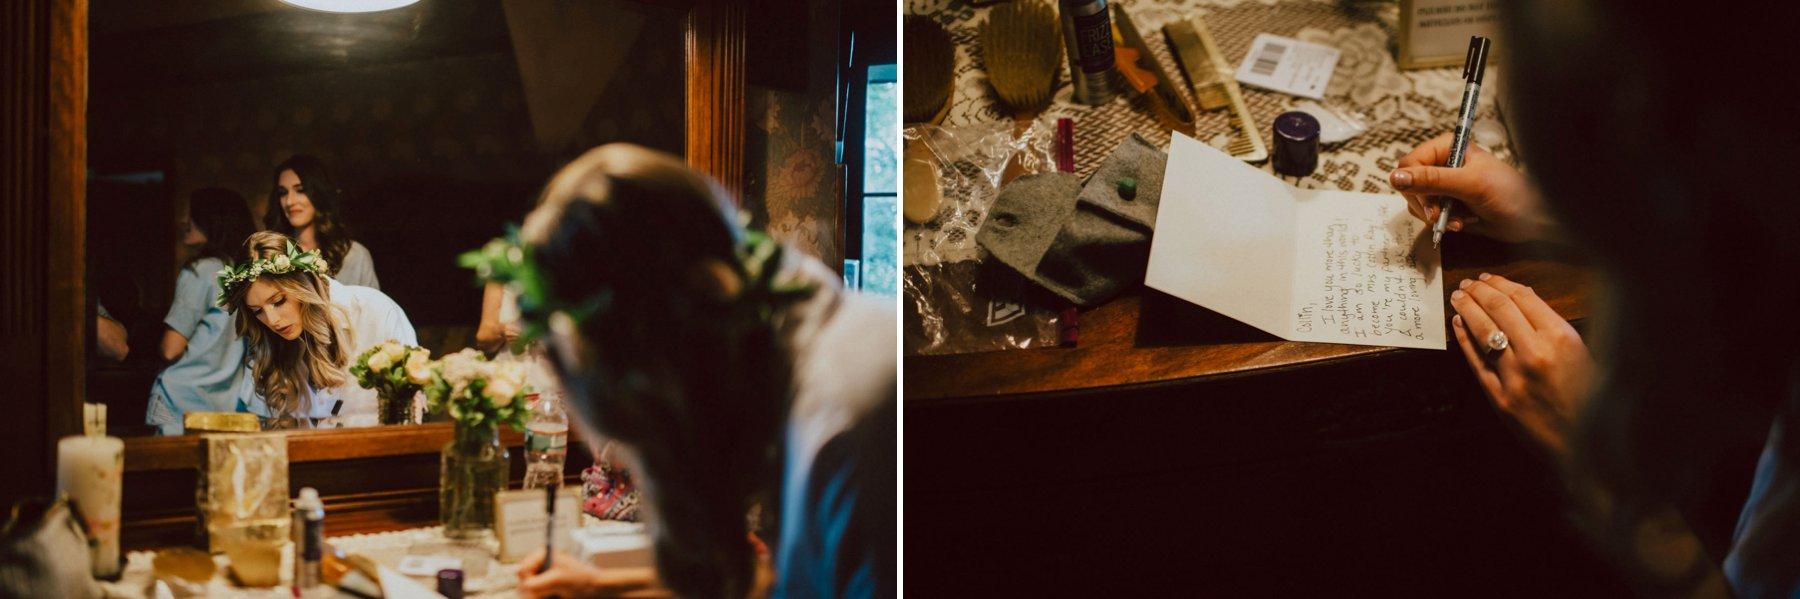 Knowlton-mansion-wedding-16.jpg